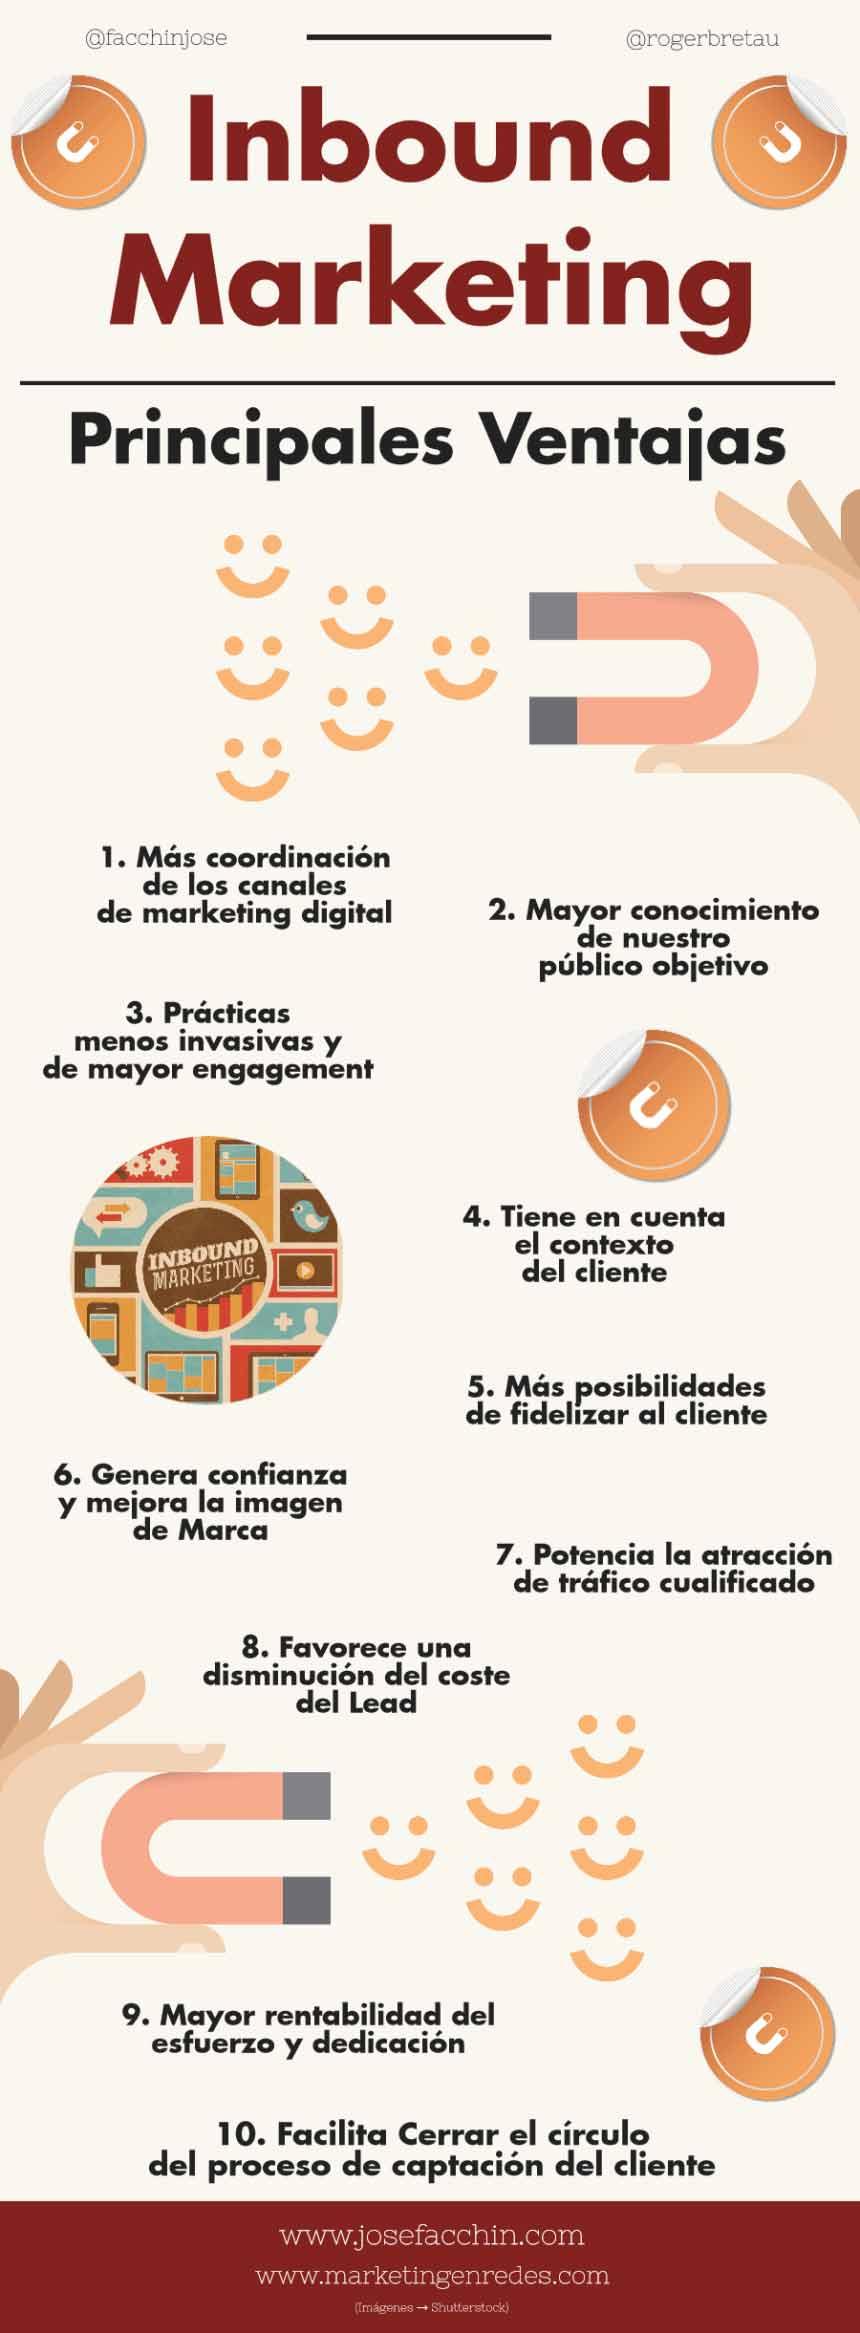 10-ventajas-inbound-marketing-infografia